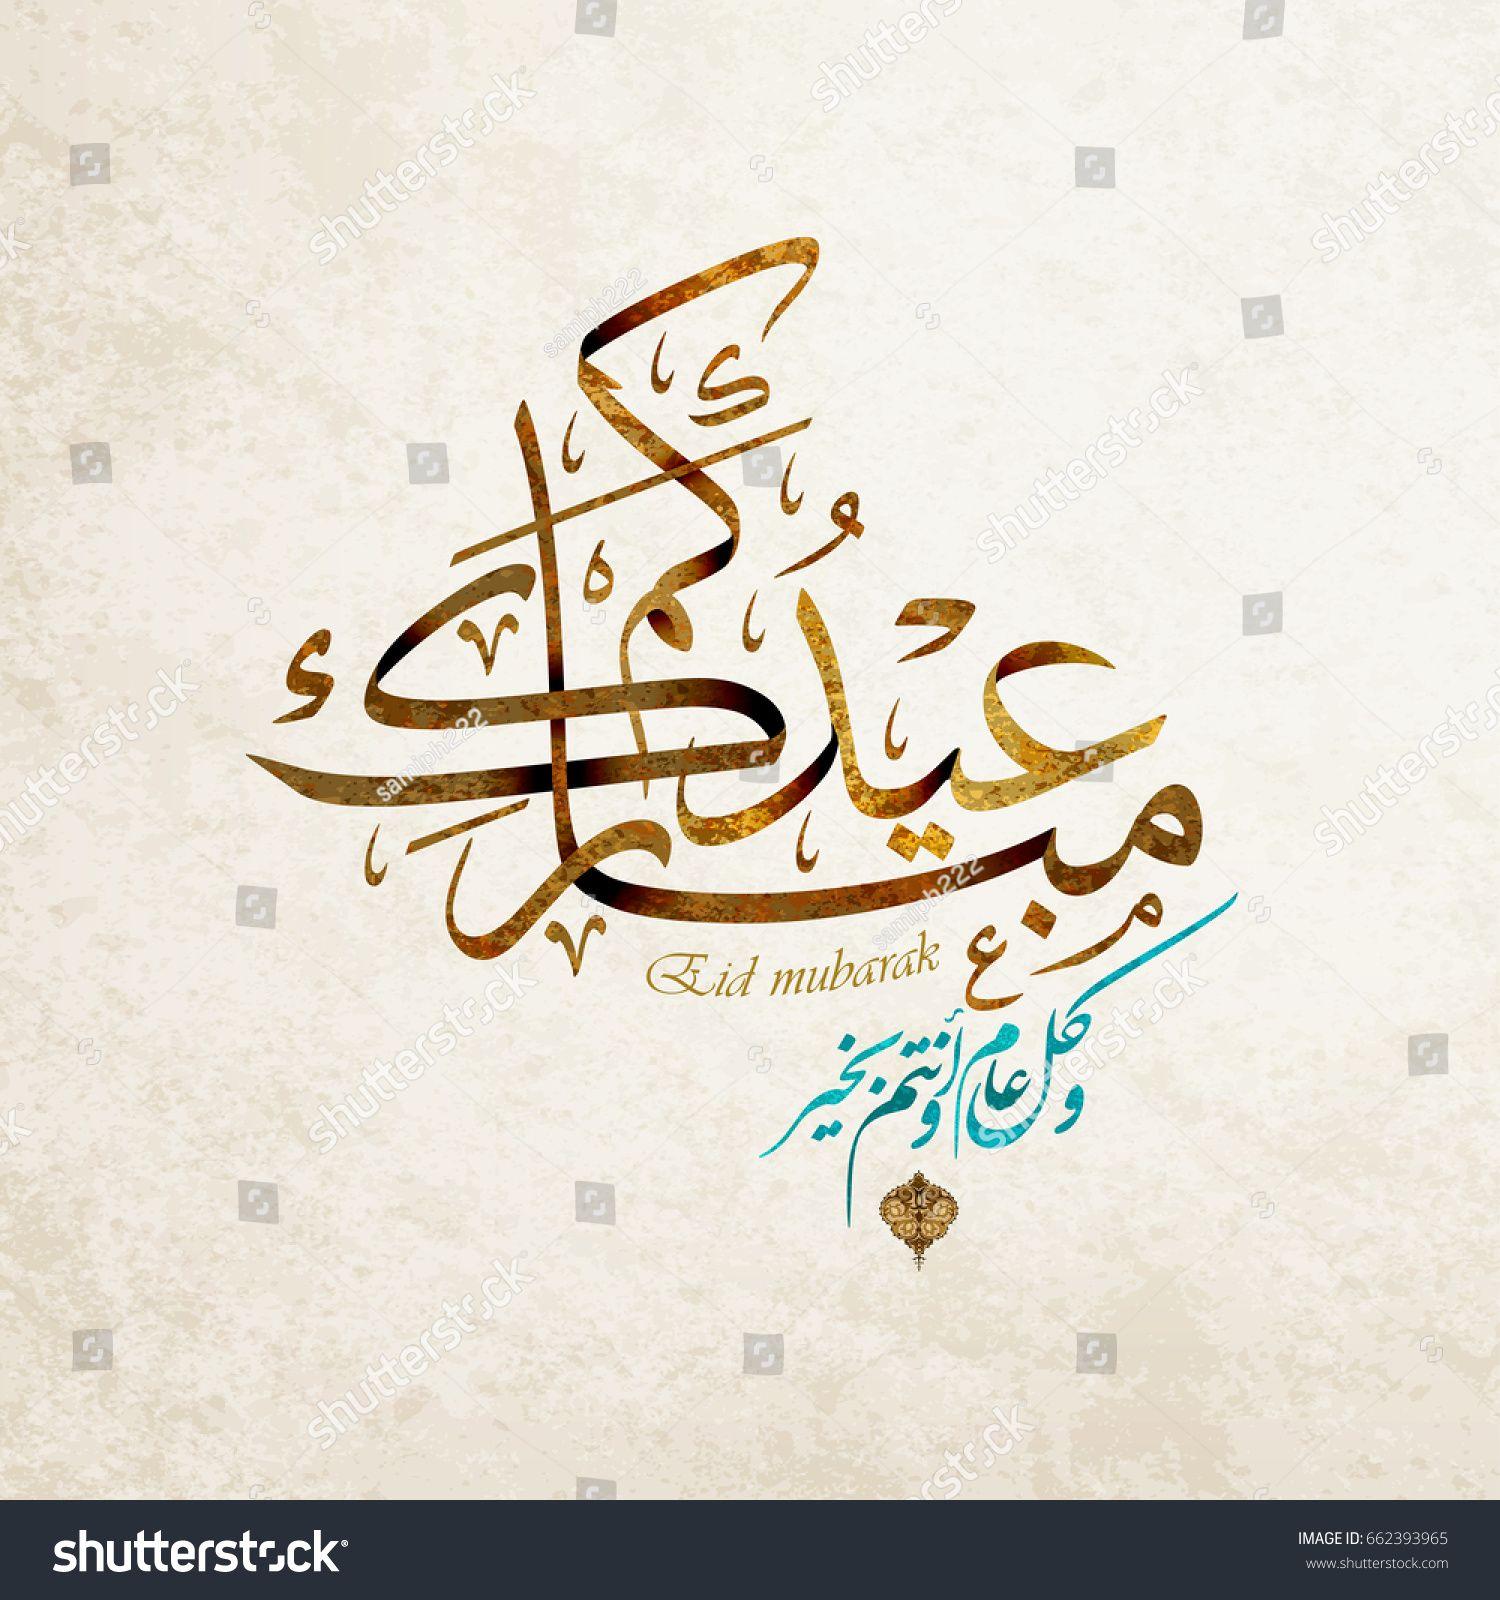 Eid Mubarak Greeting Card The Arabic Script Means Eid Mubarak